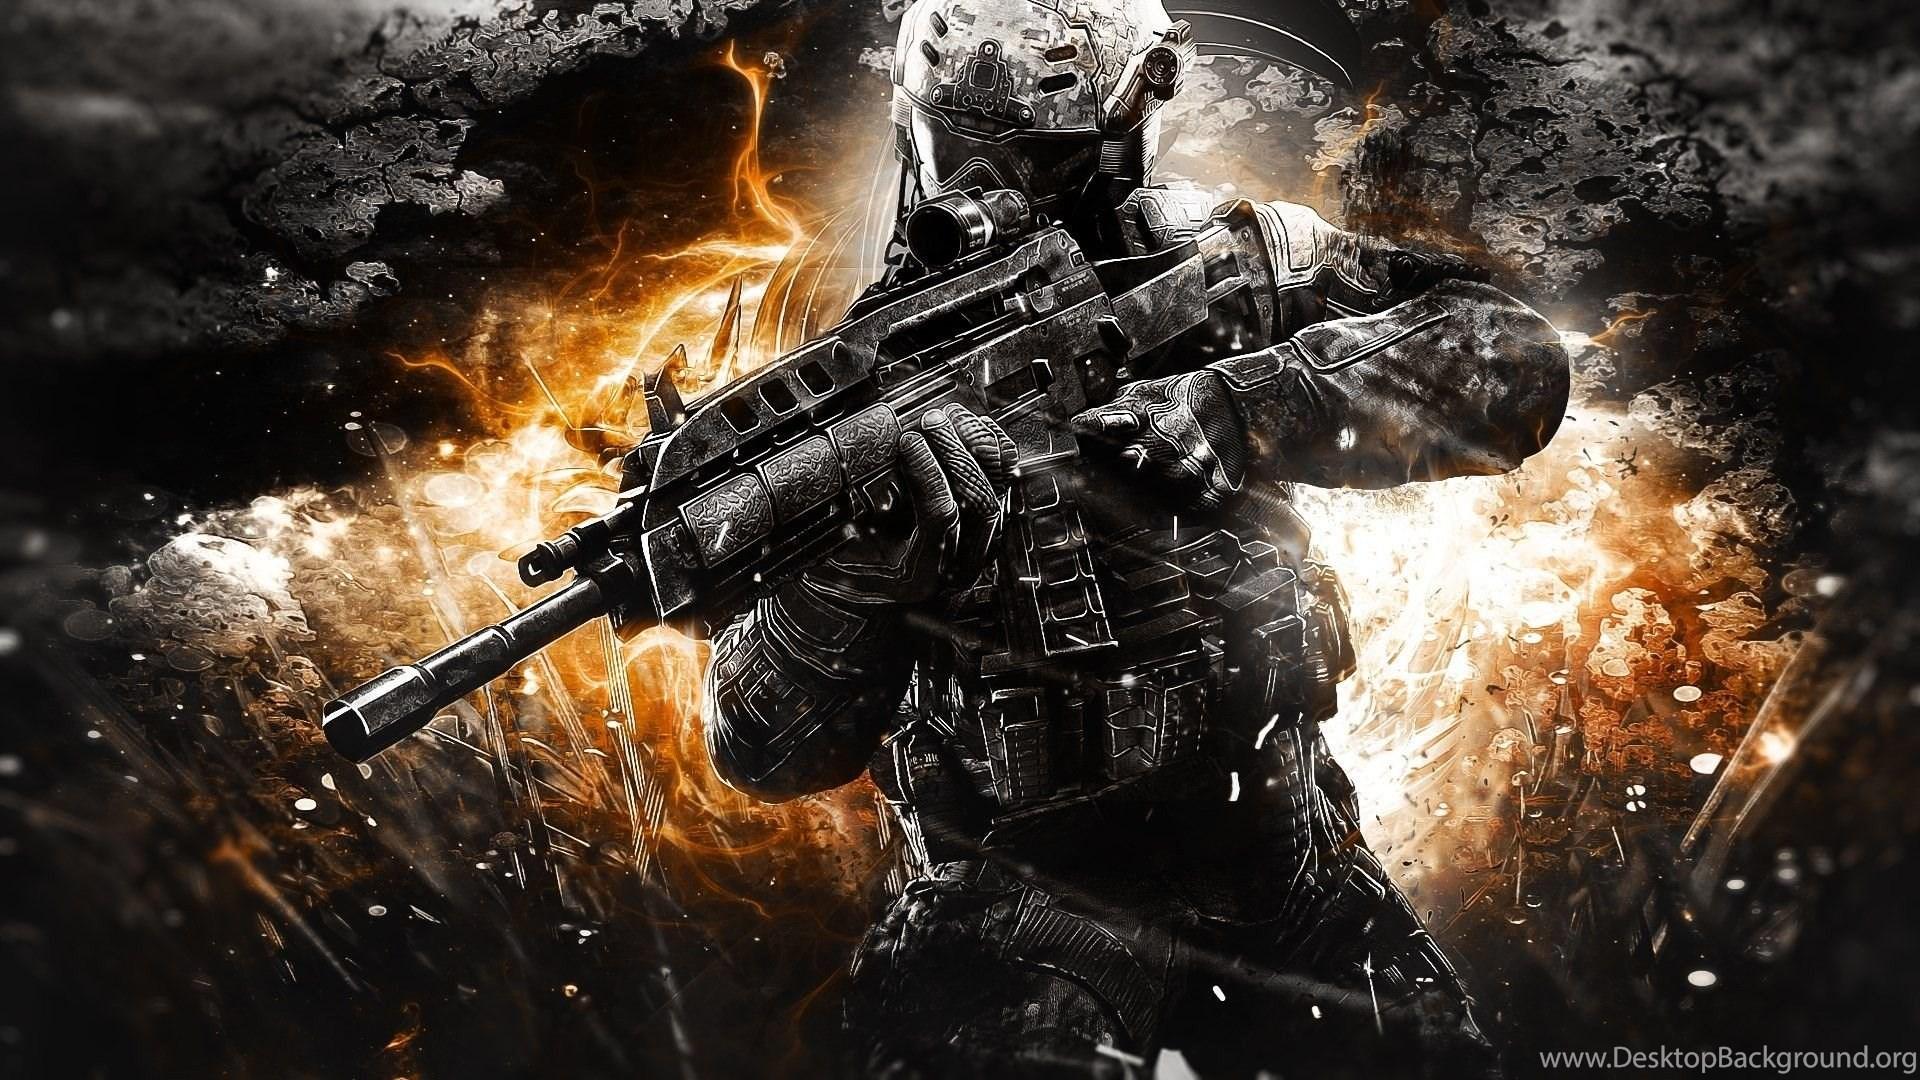 28 Call Of Duty Black Ops Iii Hd Wallpapers Desktop Background